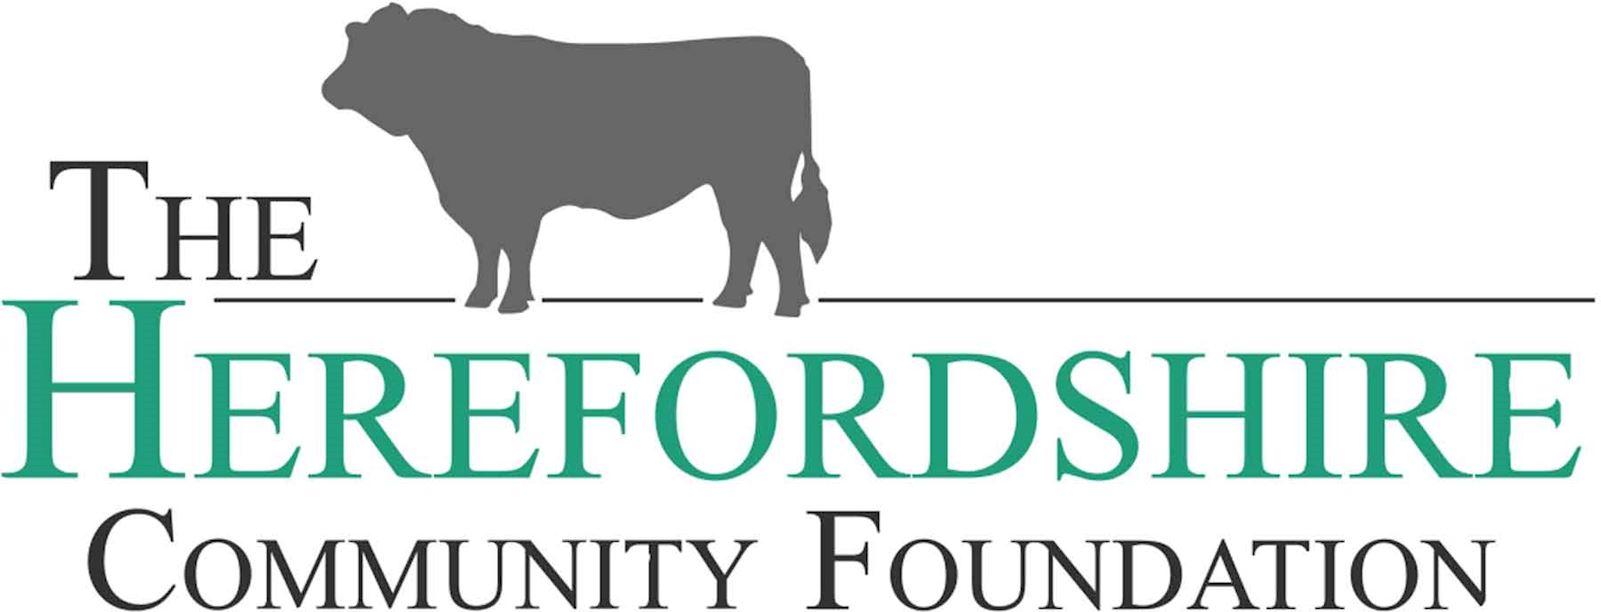 Herefordshire Community Foundation